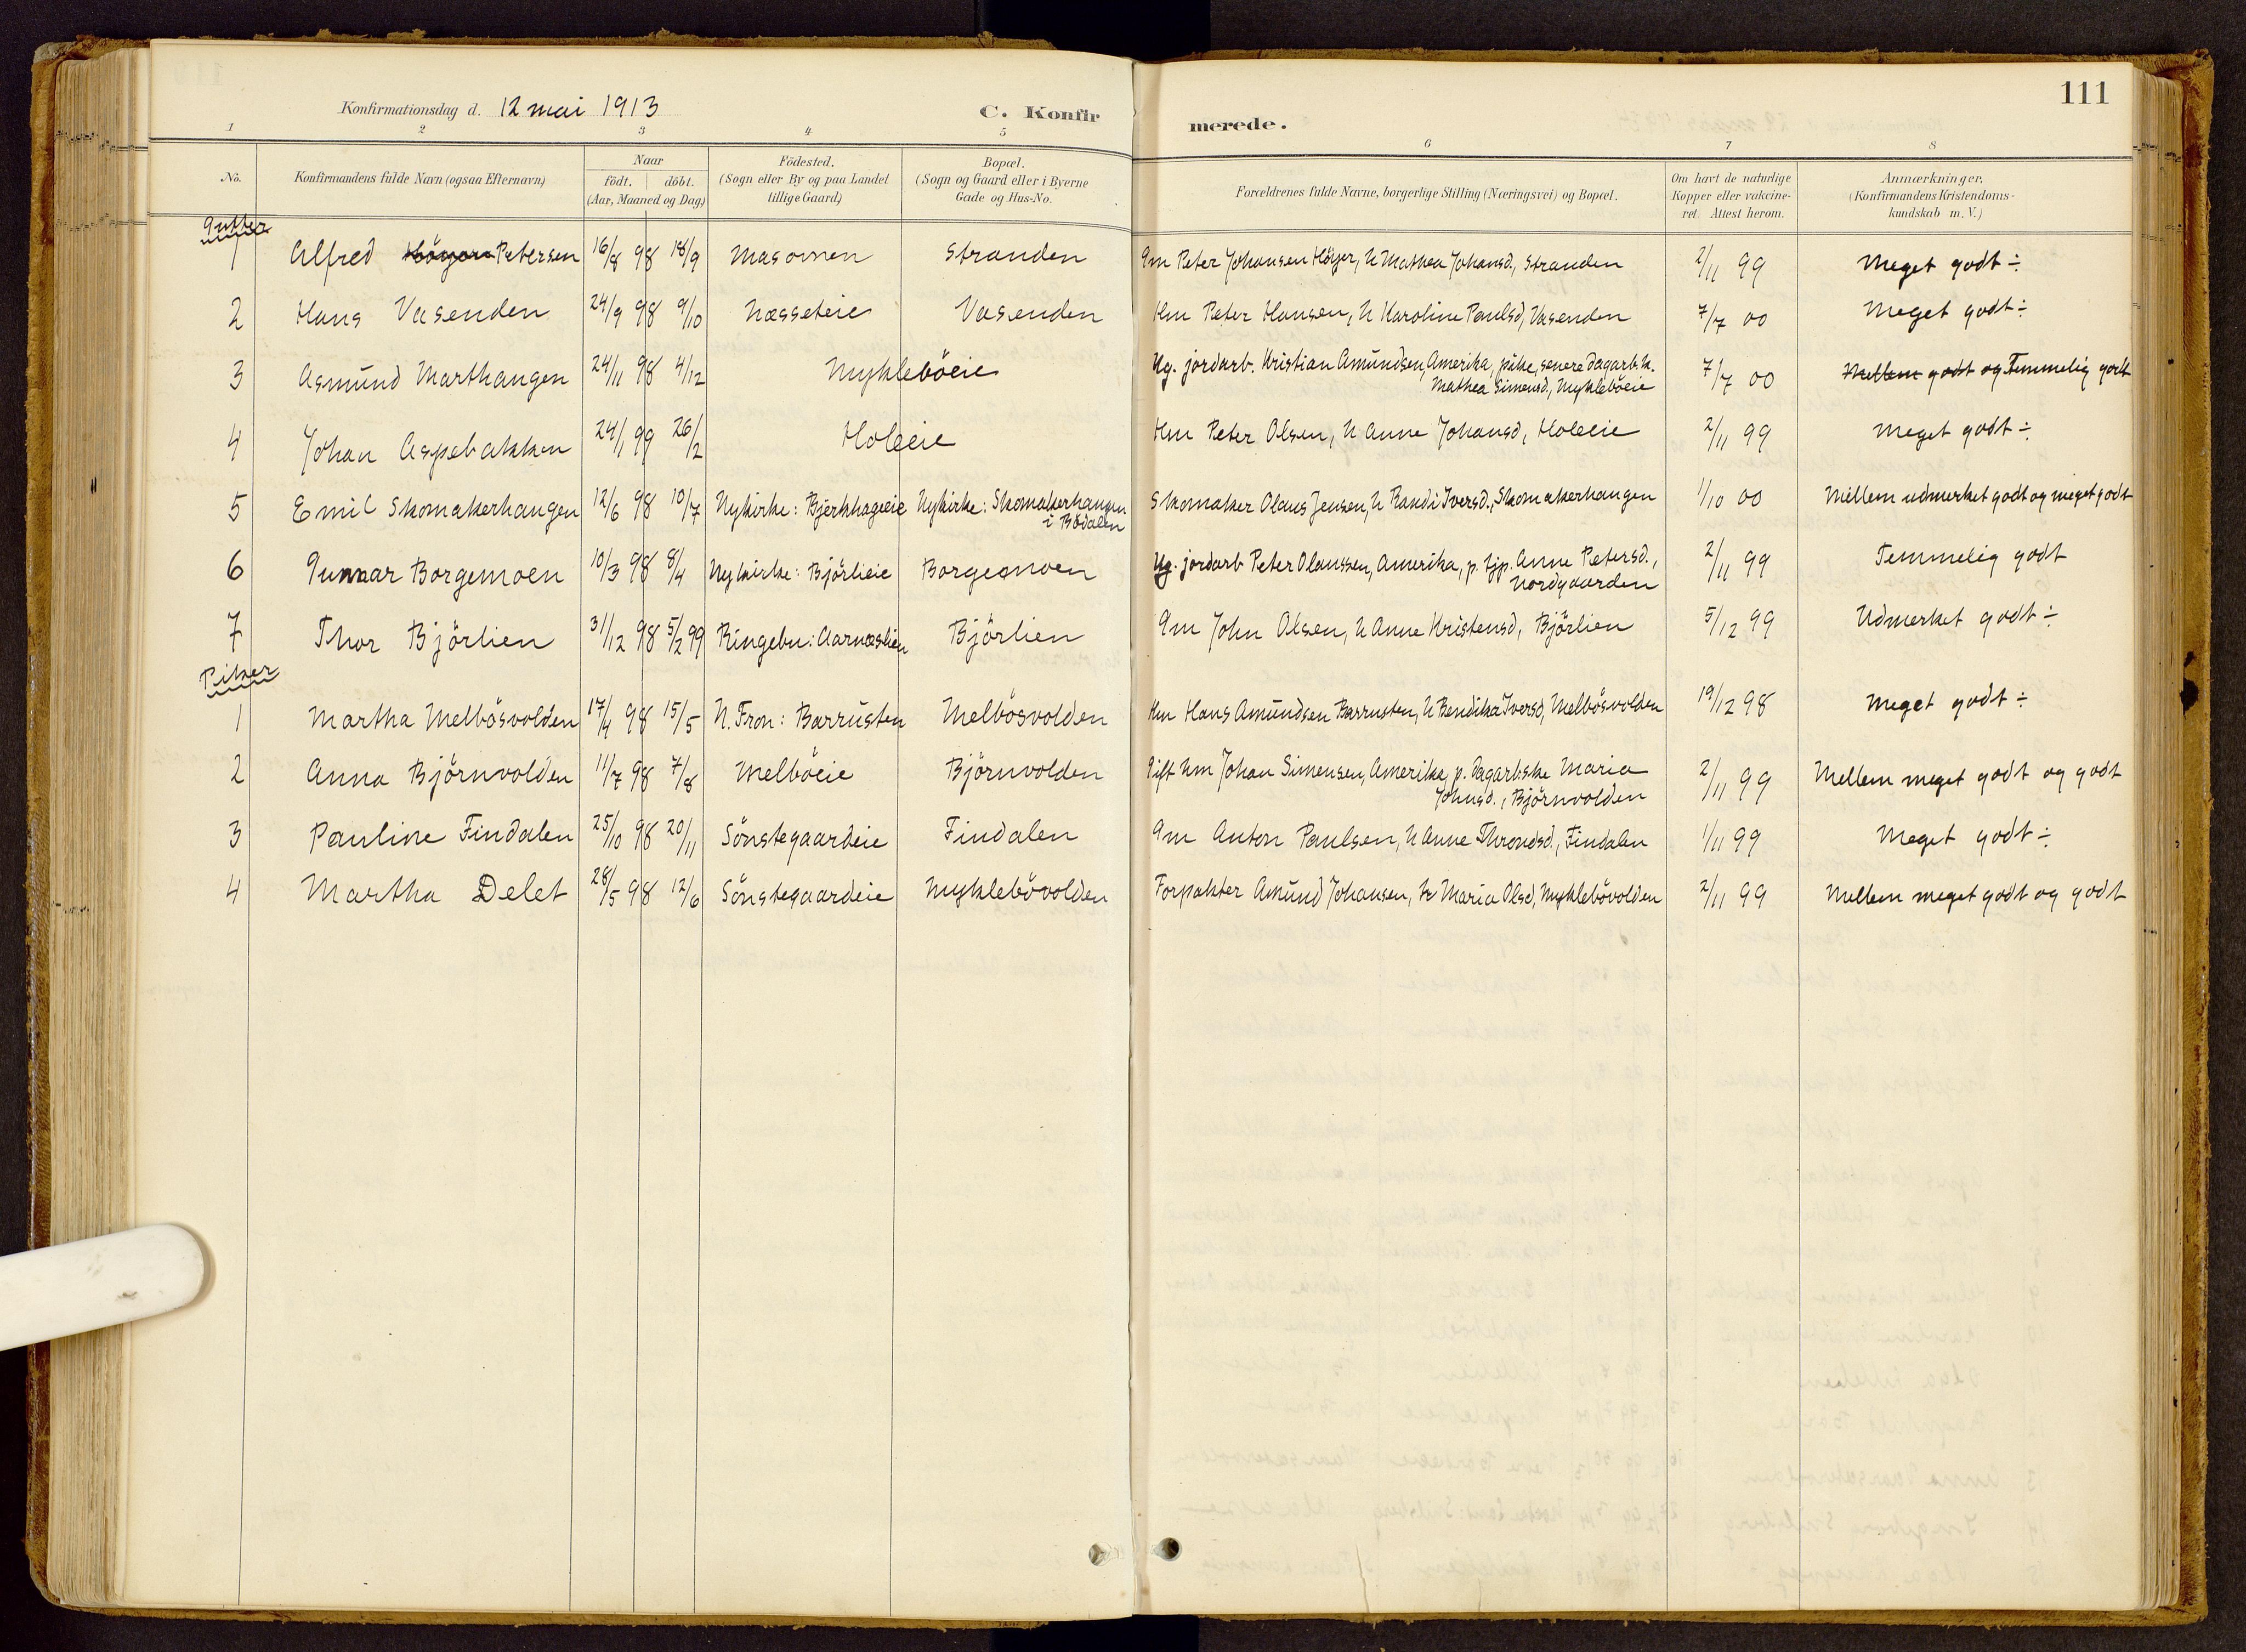 SAH, Vestre Gausdal prestekontor, Ministerialbok nr. 2, 1887-1918, s. 111